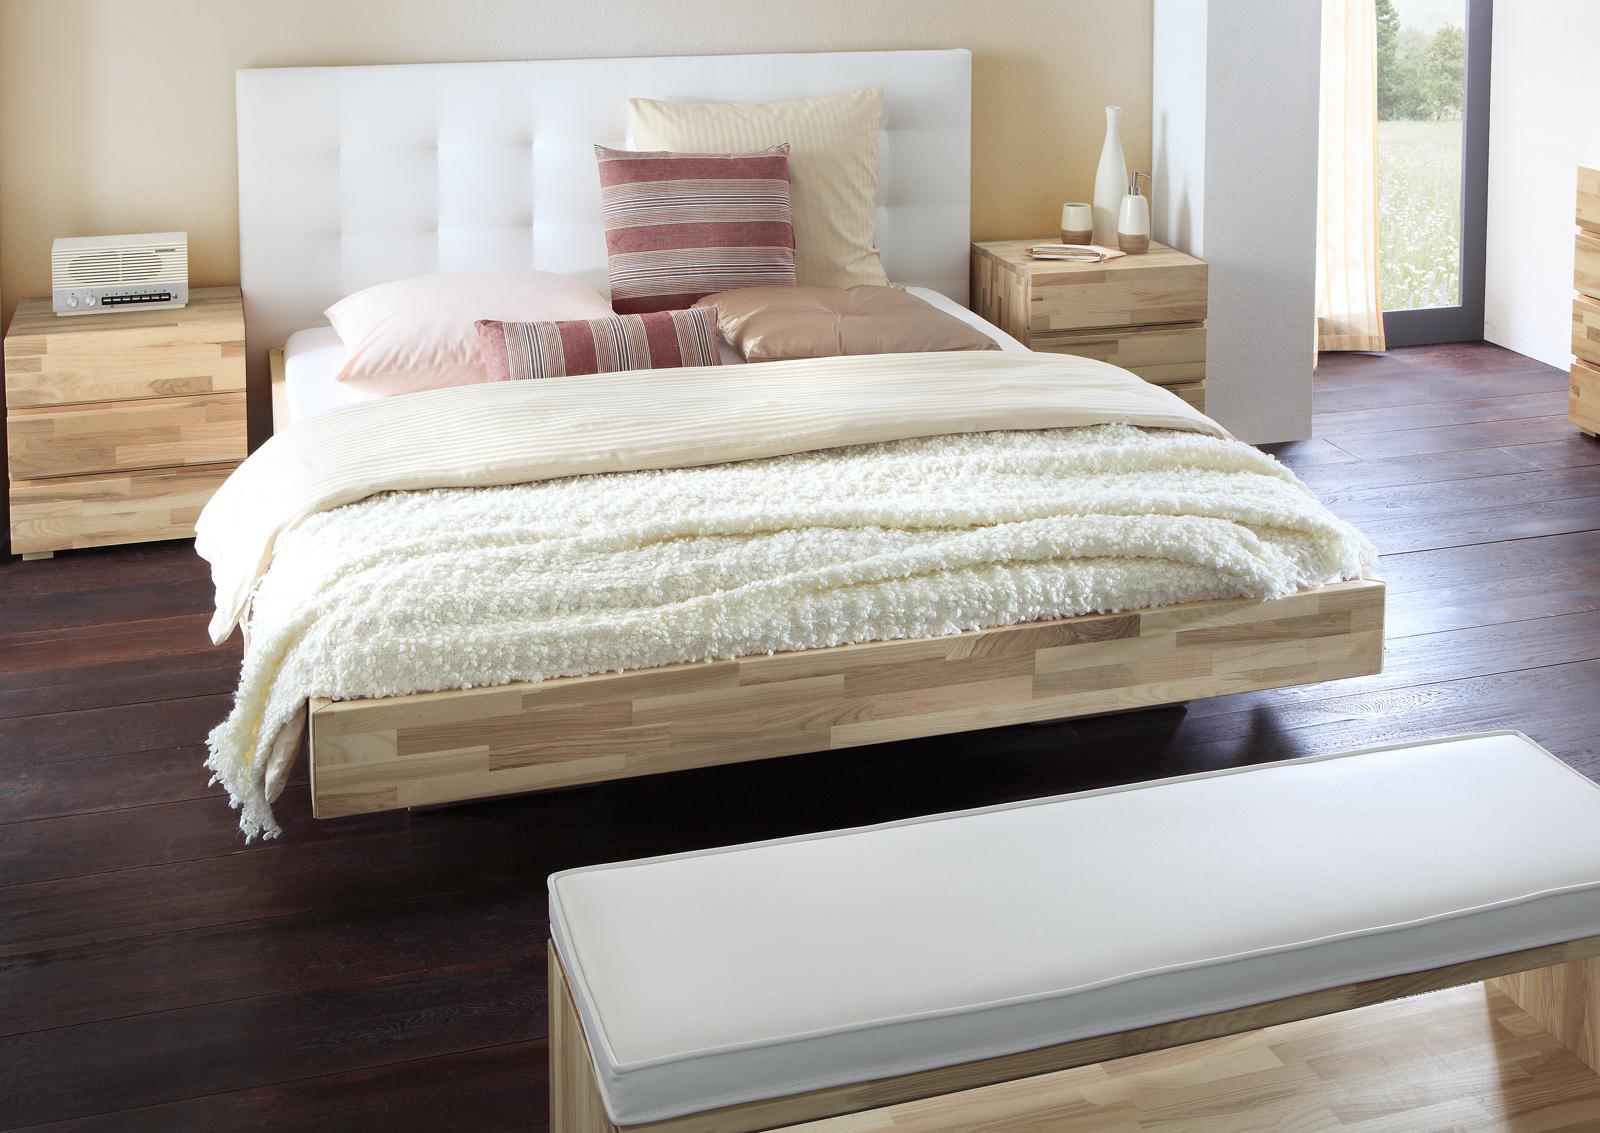 Rustikale Betten im Landhausstil hier kaufen | BETTEN.de